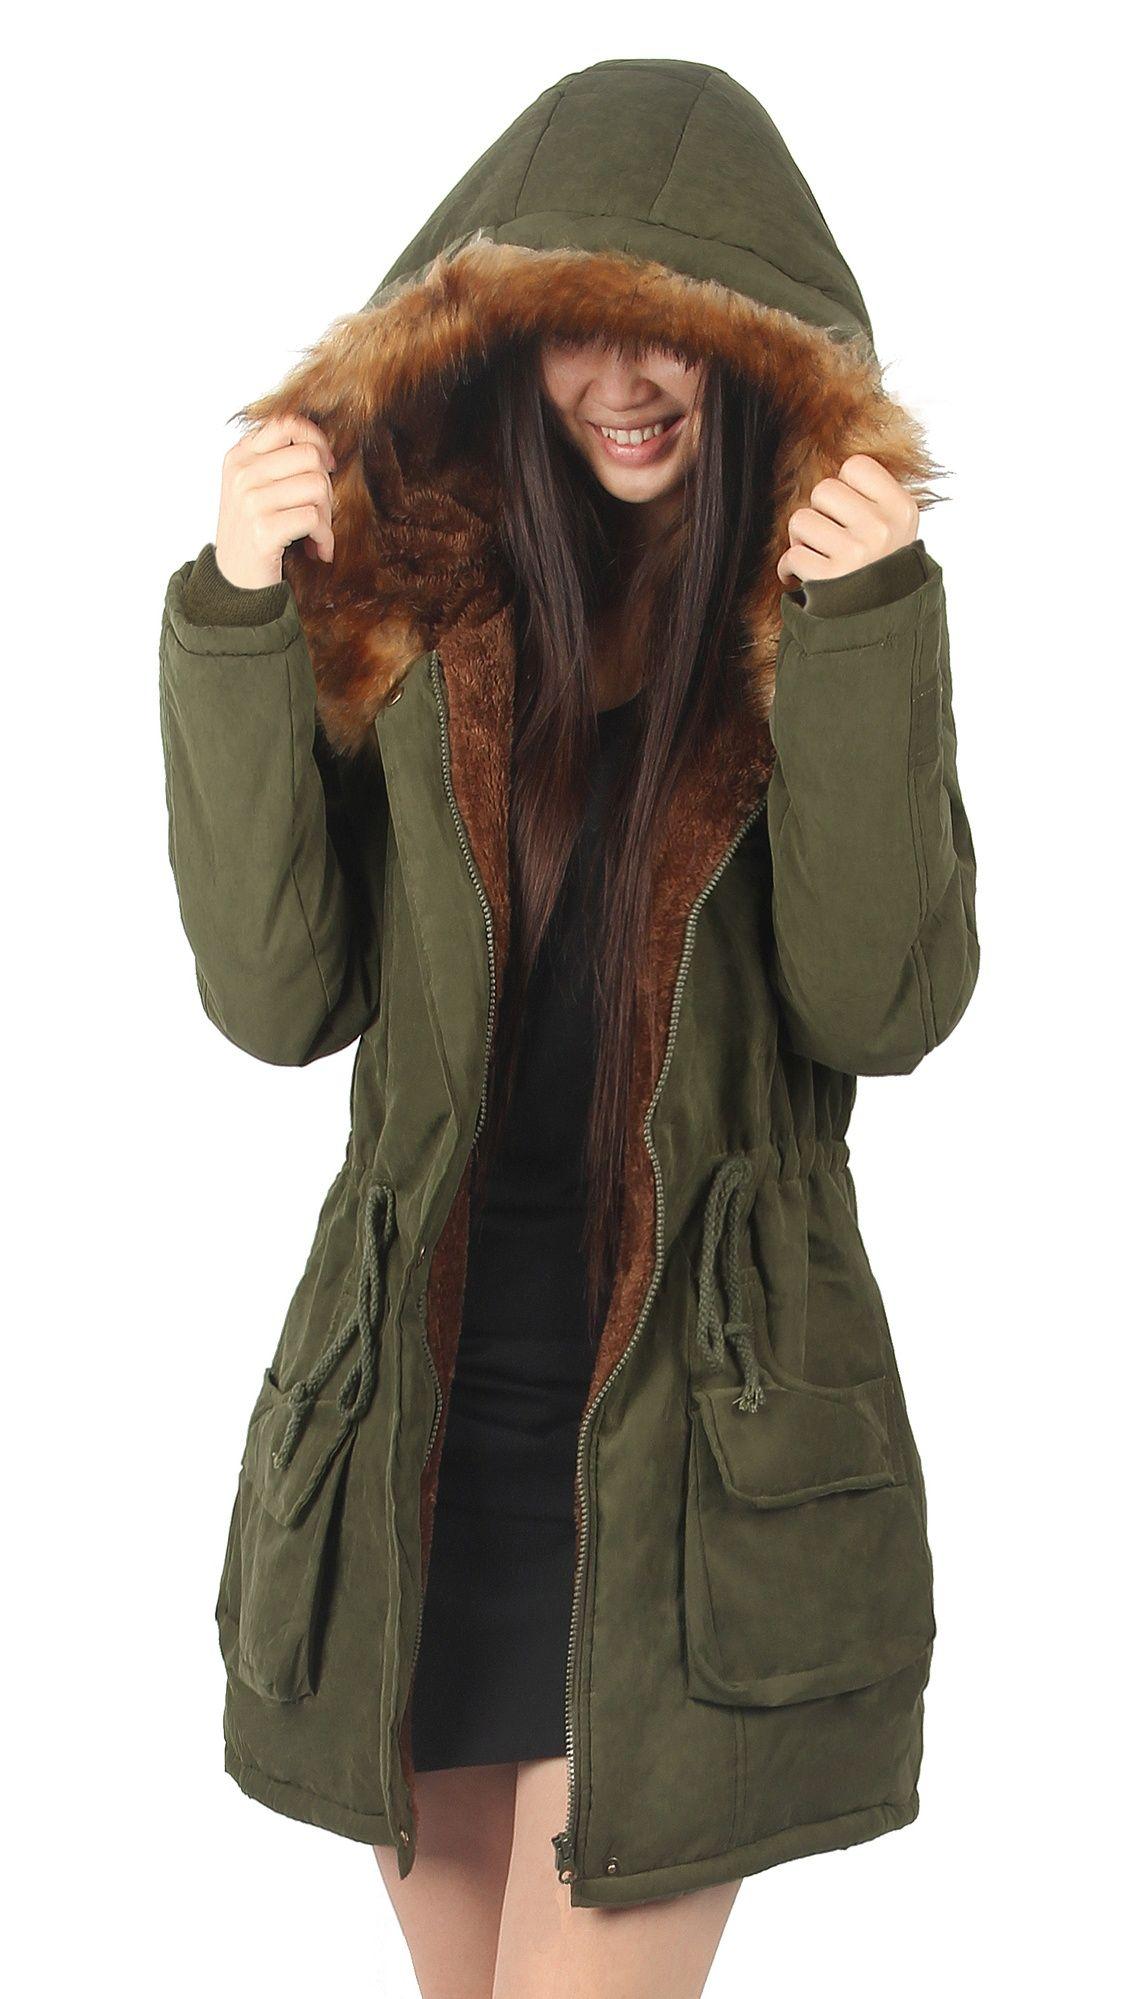 Ilovesia Winter Fur Lined Coats For Women Parka Jacket Green Size 8 Walmart Com Stylish Winter Coats Parka Jacket Women Womens Hooded Coat [ 1999 x 1125 Pixel ]